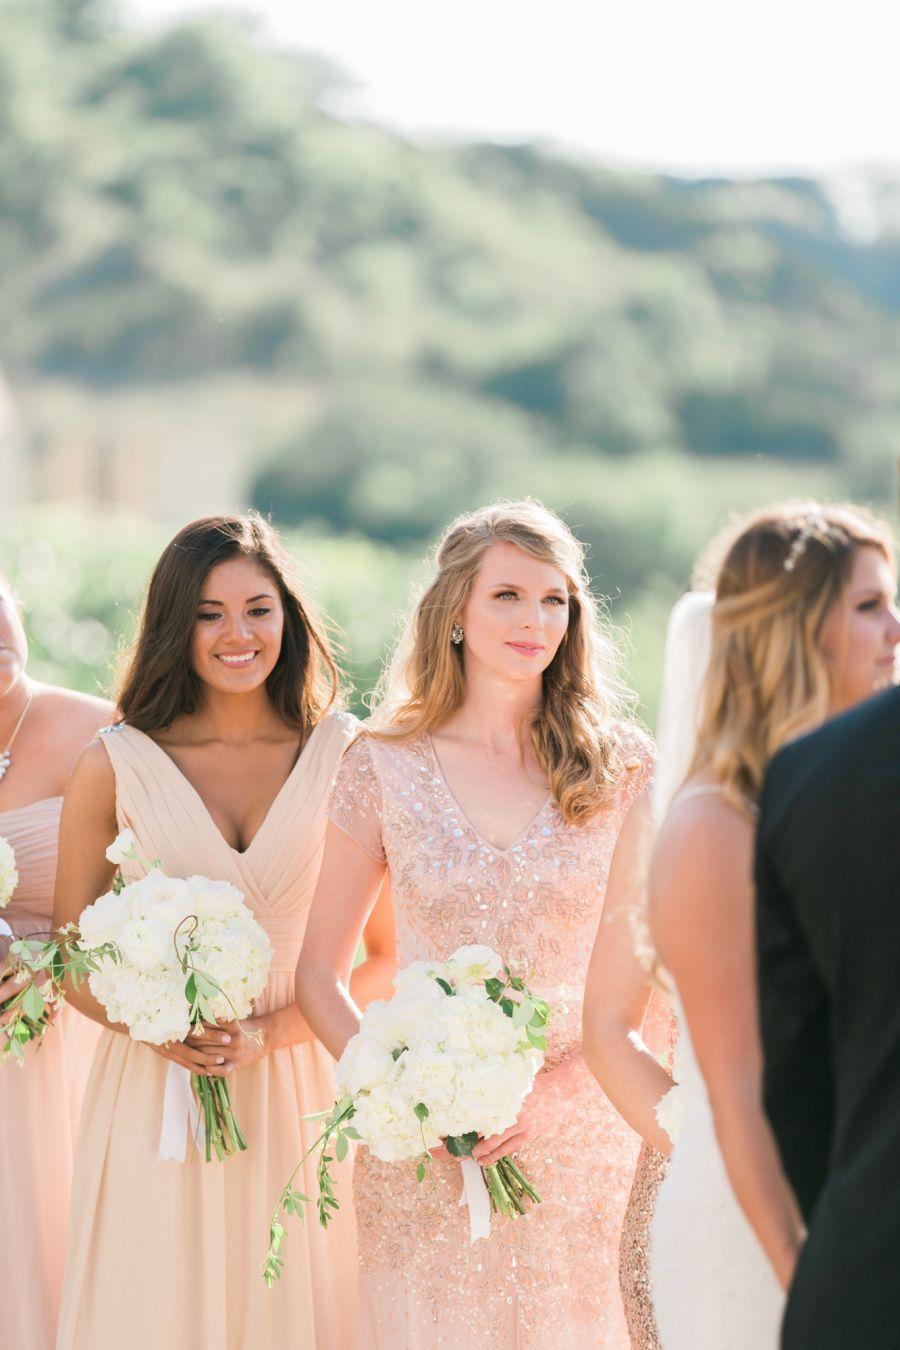 Photography: Mint Photography - http://www.stylemepretty.com/portfolio/mint-photography Wedding Dress: Jacinda Gown By Watters - http://www.stylemepretty.com/portfolio/jacinda-gown-by-watters   Read More on SMP: http://www.stylemepretty.com/2015/07/20/elegant-austin-lakeside-estate-wedding/